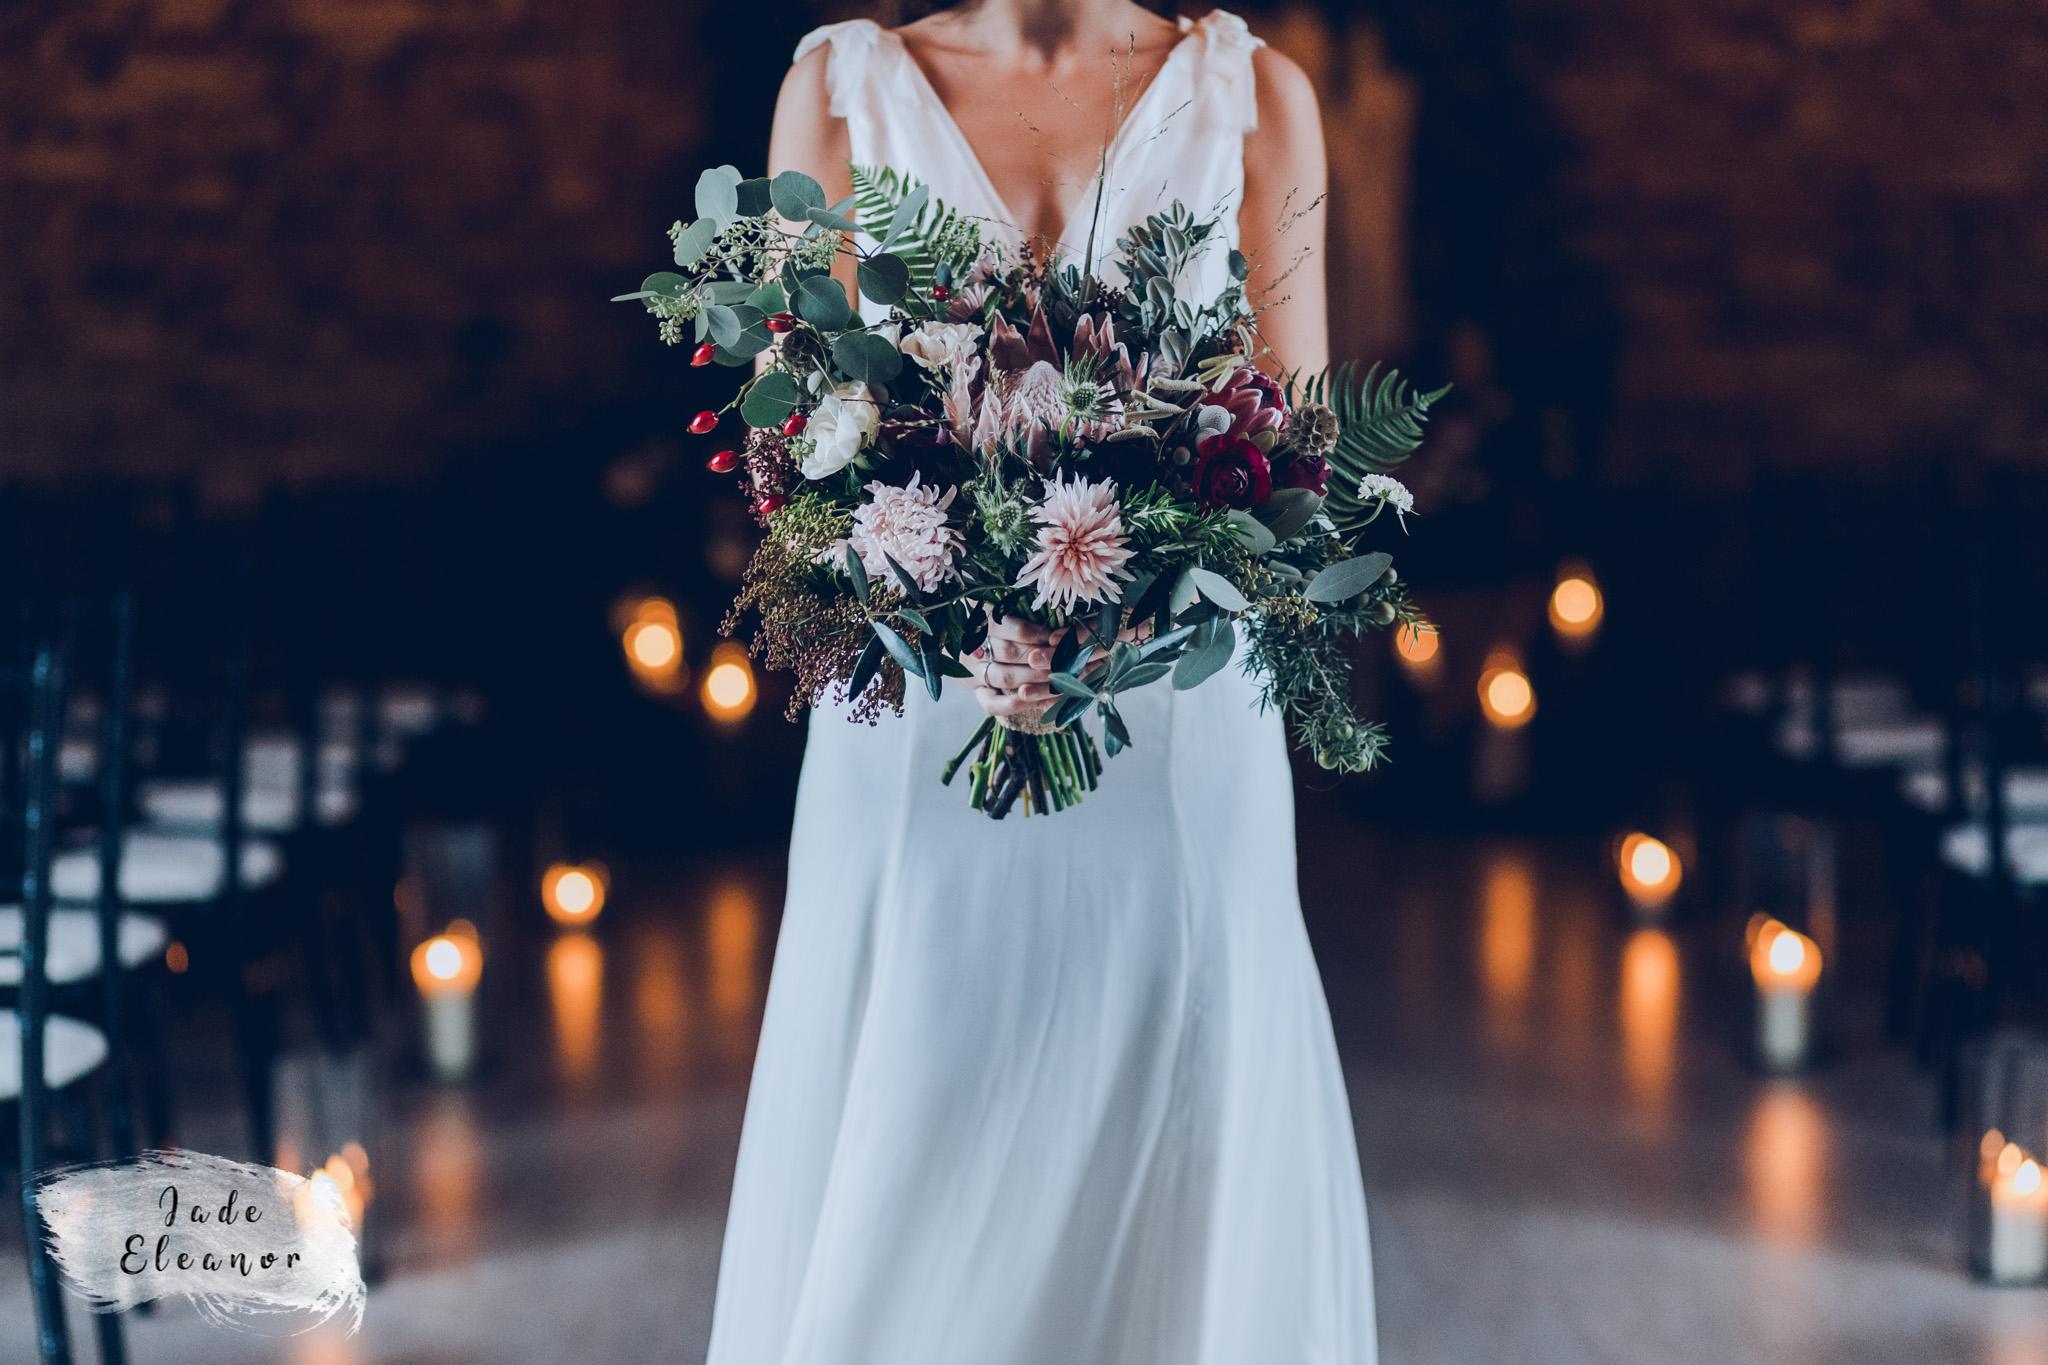 Bysshe Court Barn Wedding Jade Eleanor Photography-5.jpg